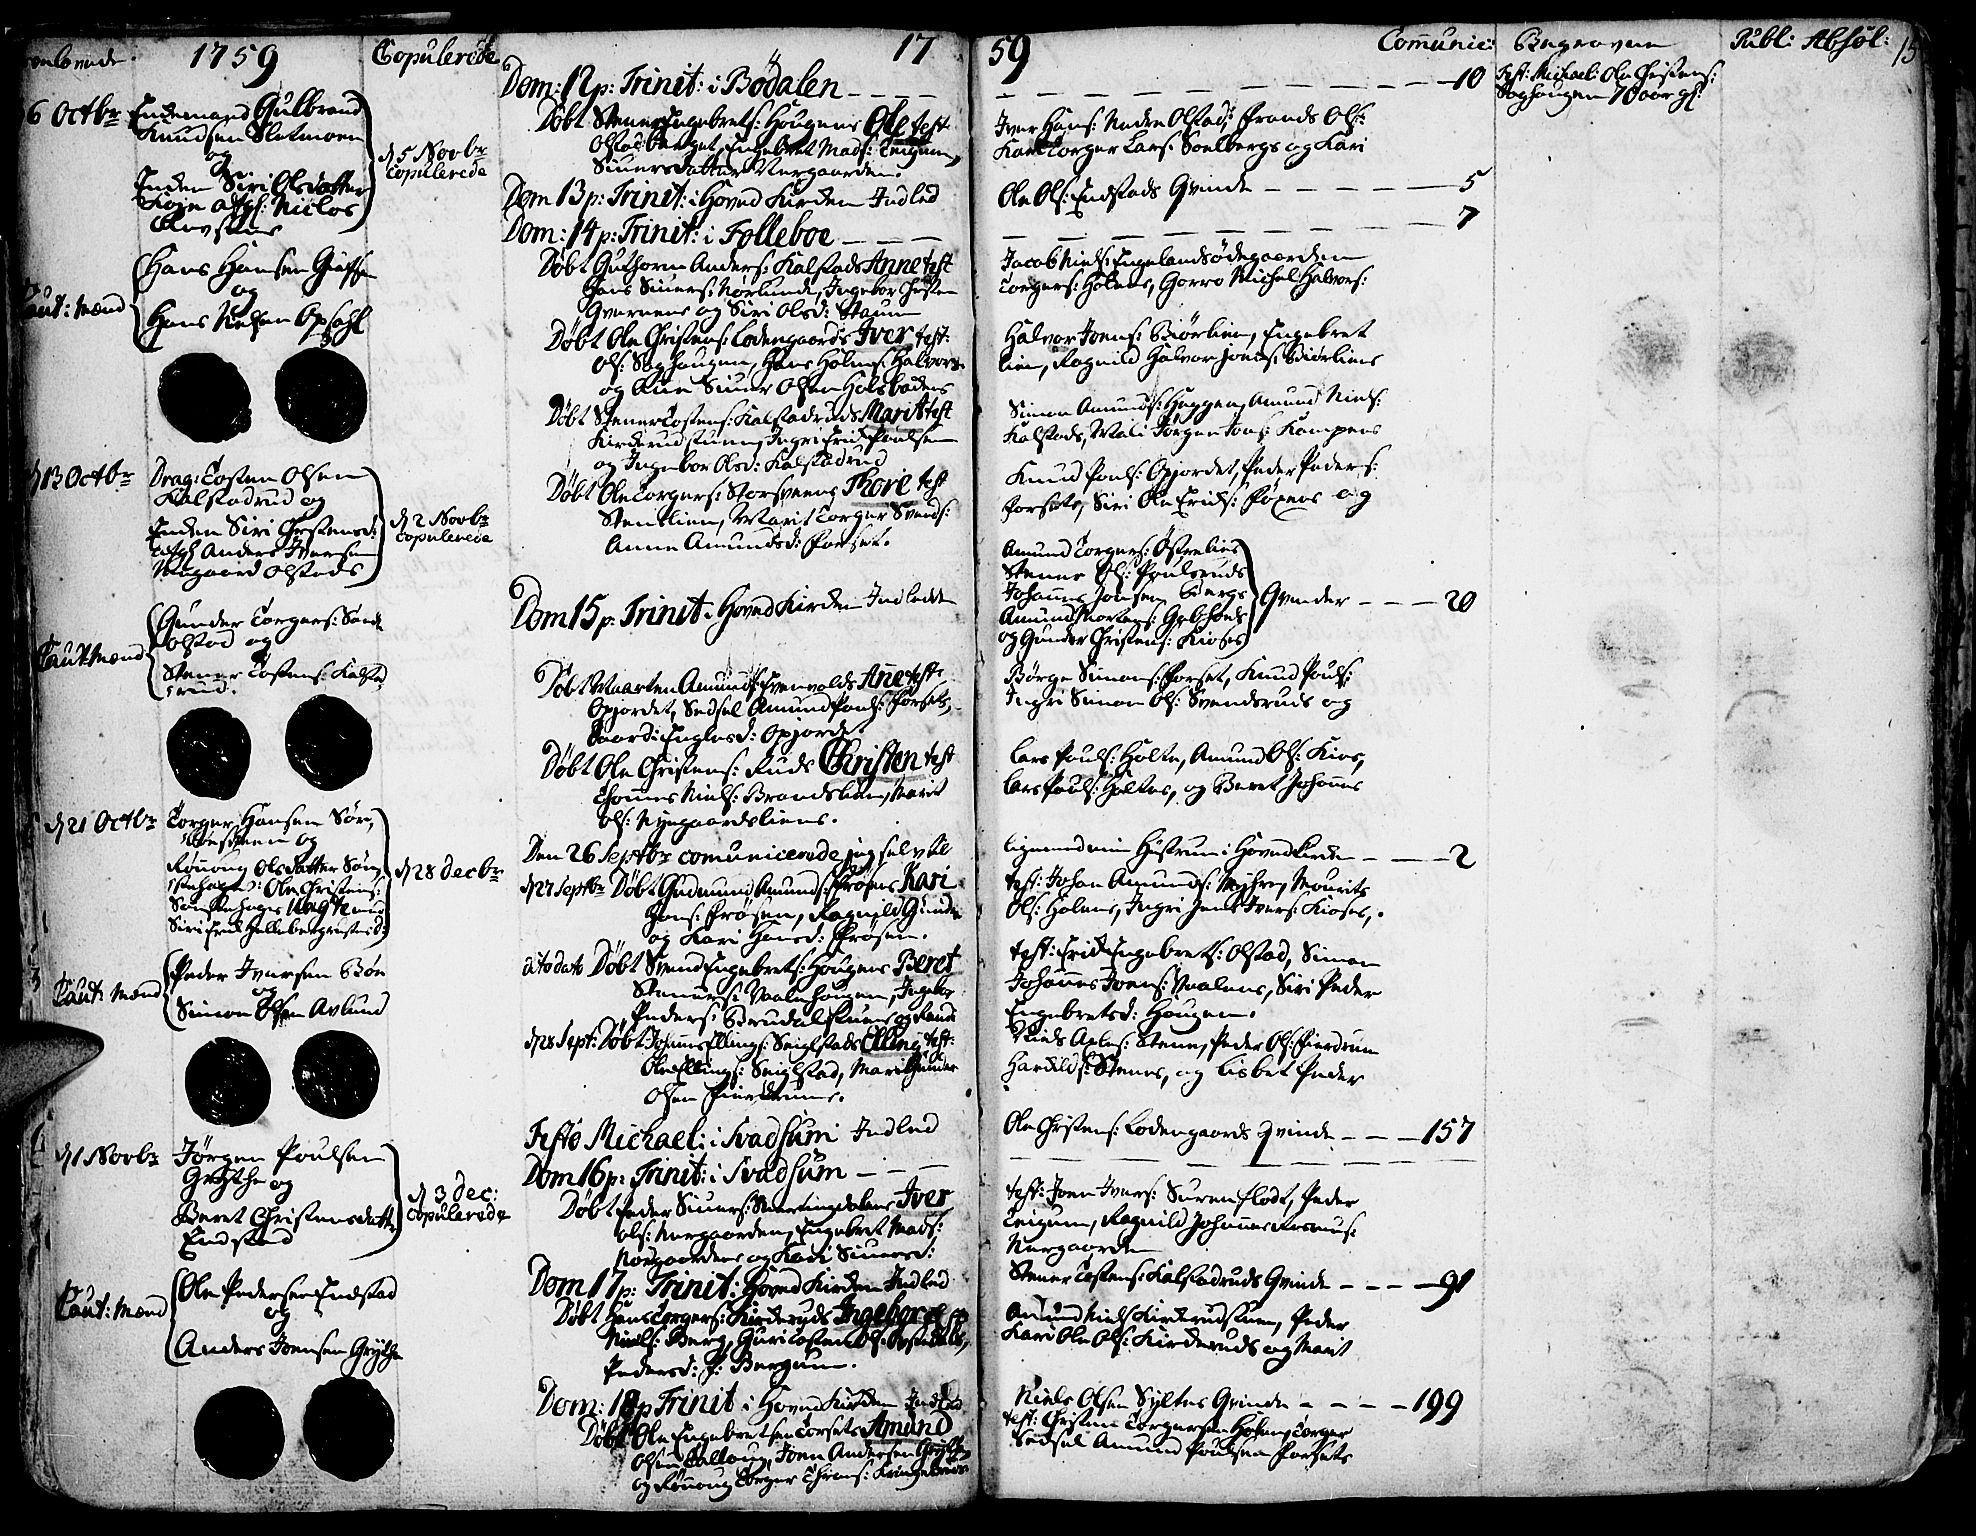 SAH, Gausdal prestekontor, Ministerialbok nr. 3, 1758-1809, s. 15